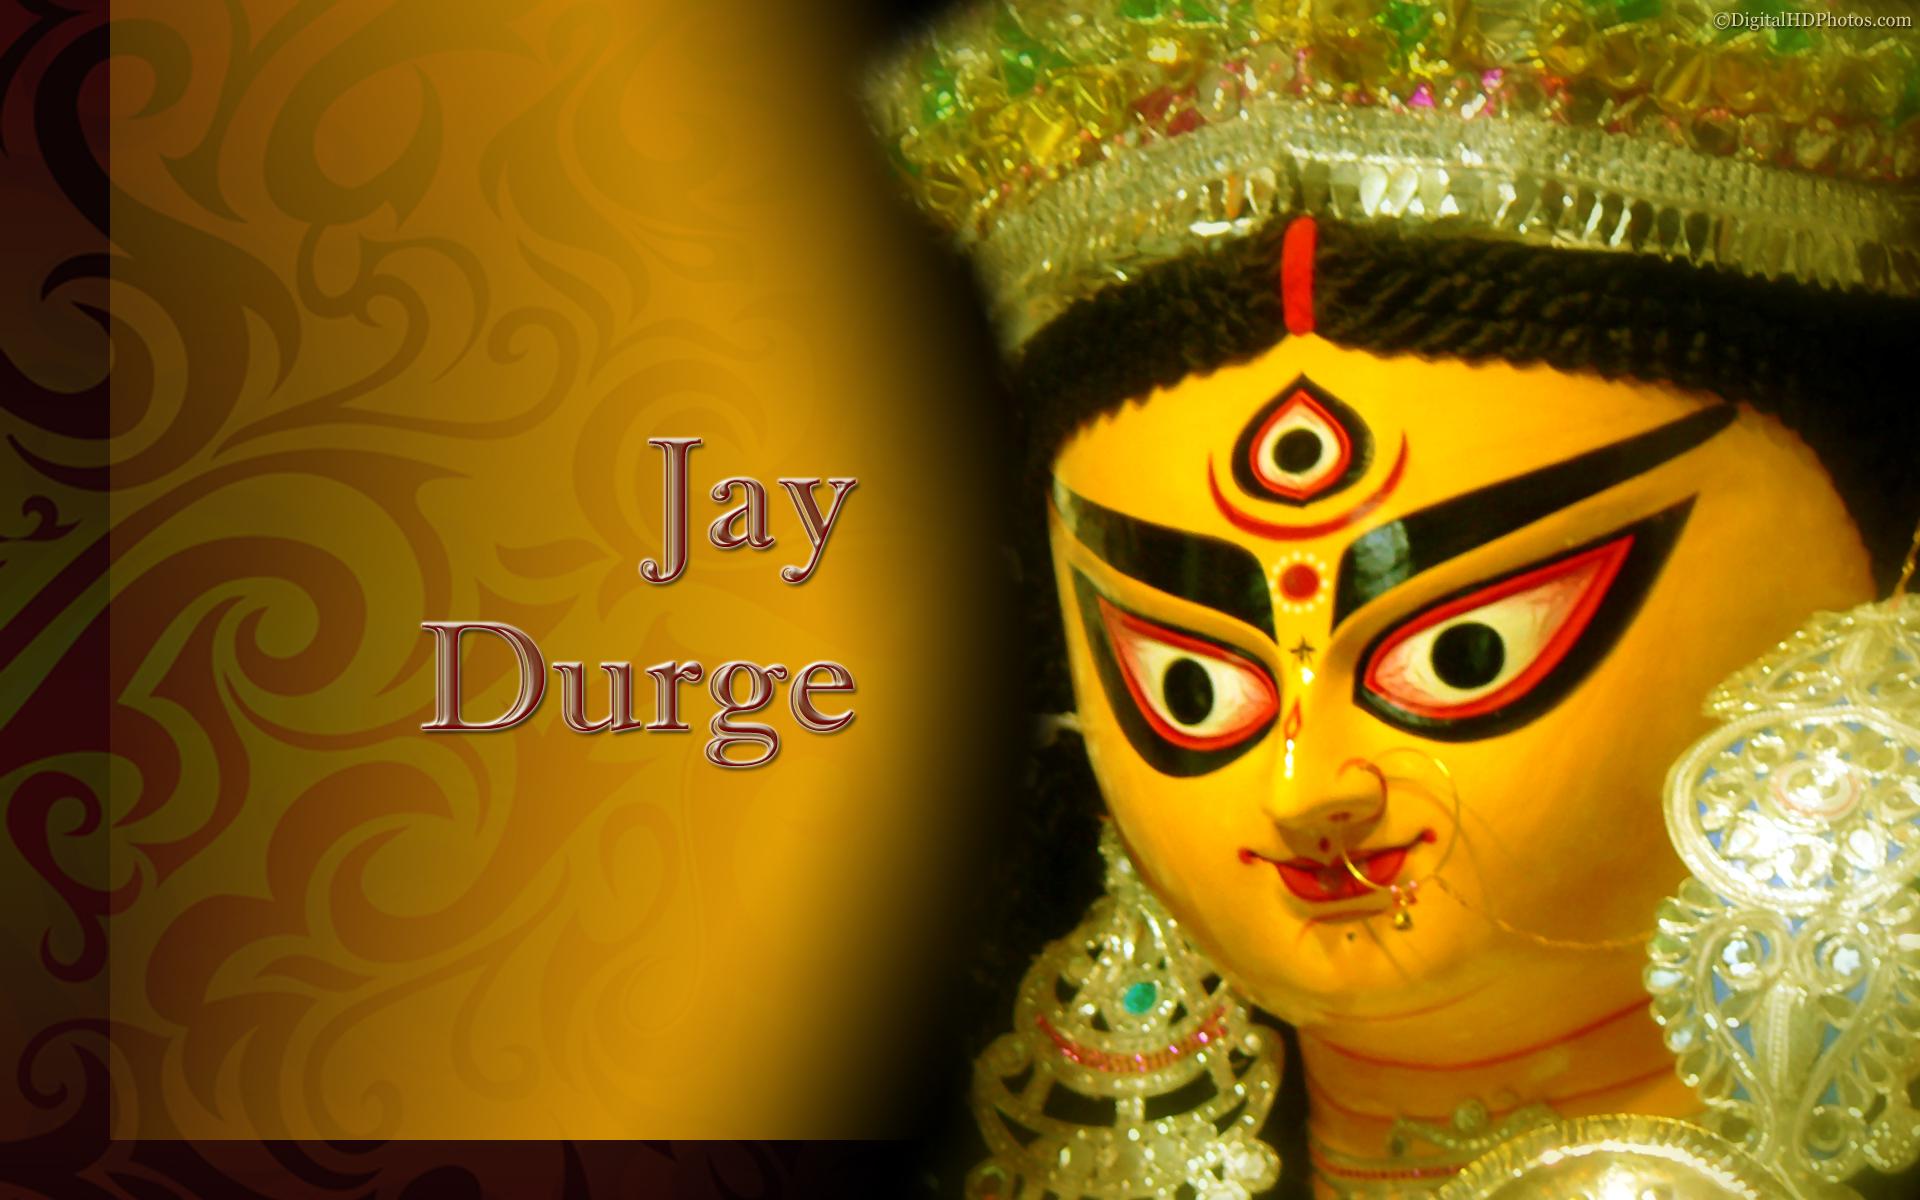 durga puja 2012 hd wallpaper desktop 28 images free durga puja